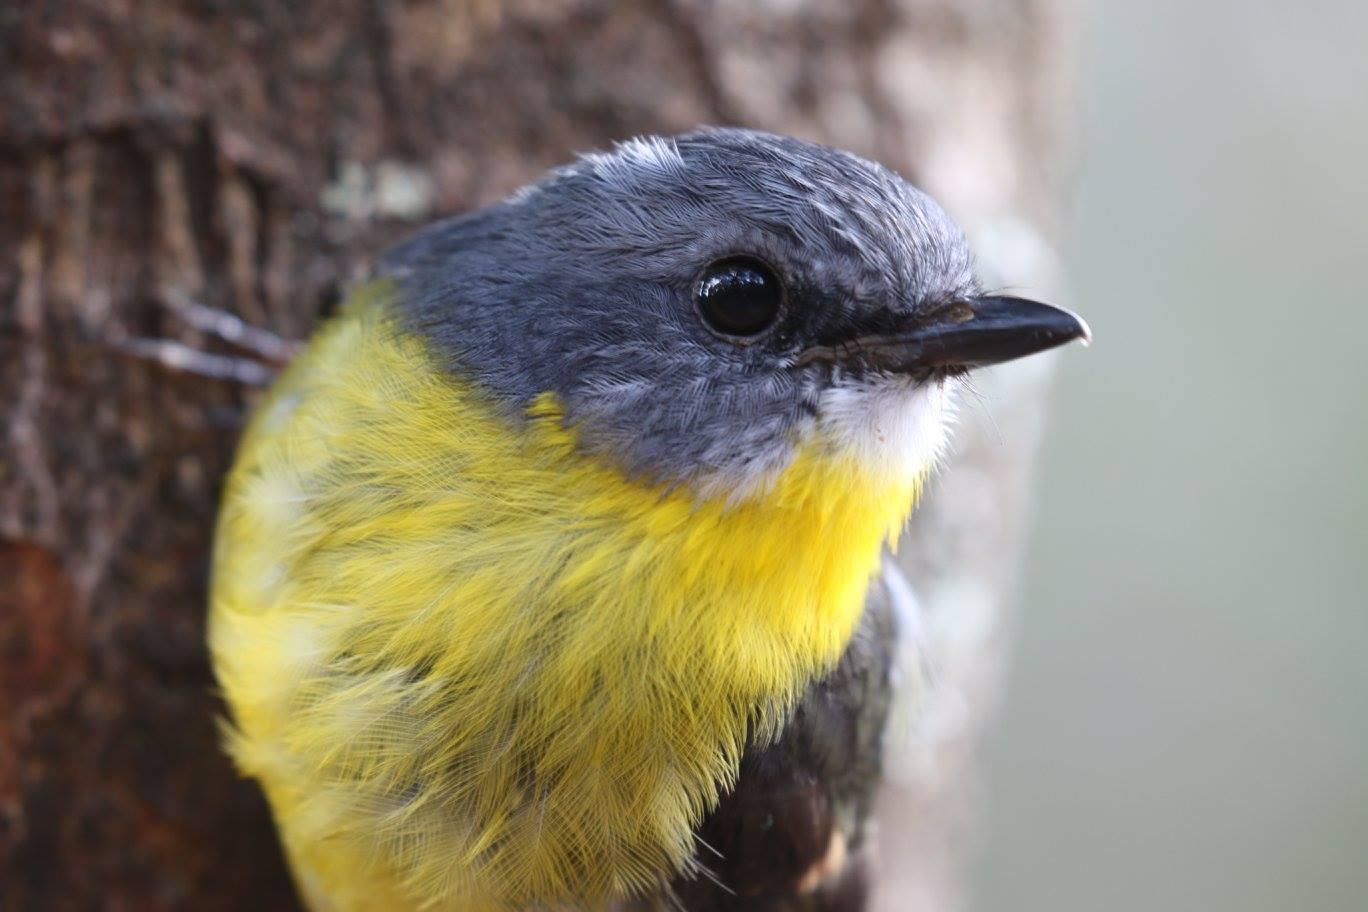 Dr Rowan mott - Birdwatcher Extraordinaire, Ecologist at Monash University and Writer for Wild Melbourne.